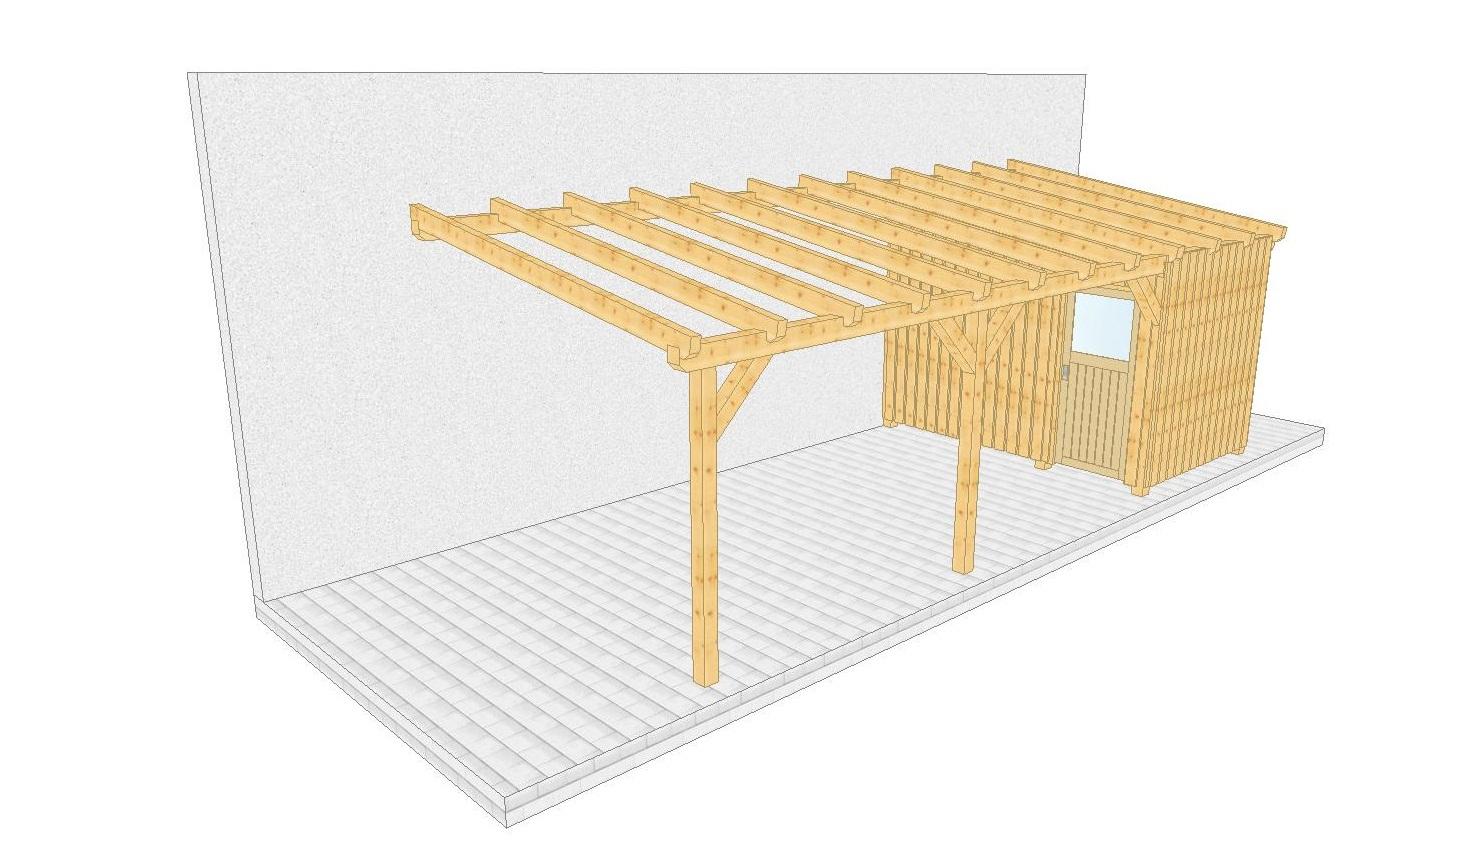 konfigurator holztechnik l tzsch gmbh. Black Bedroom Furniture Sets. Home Design Ideas